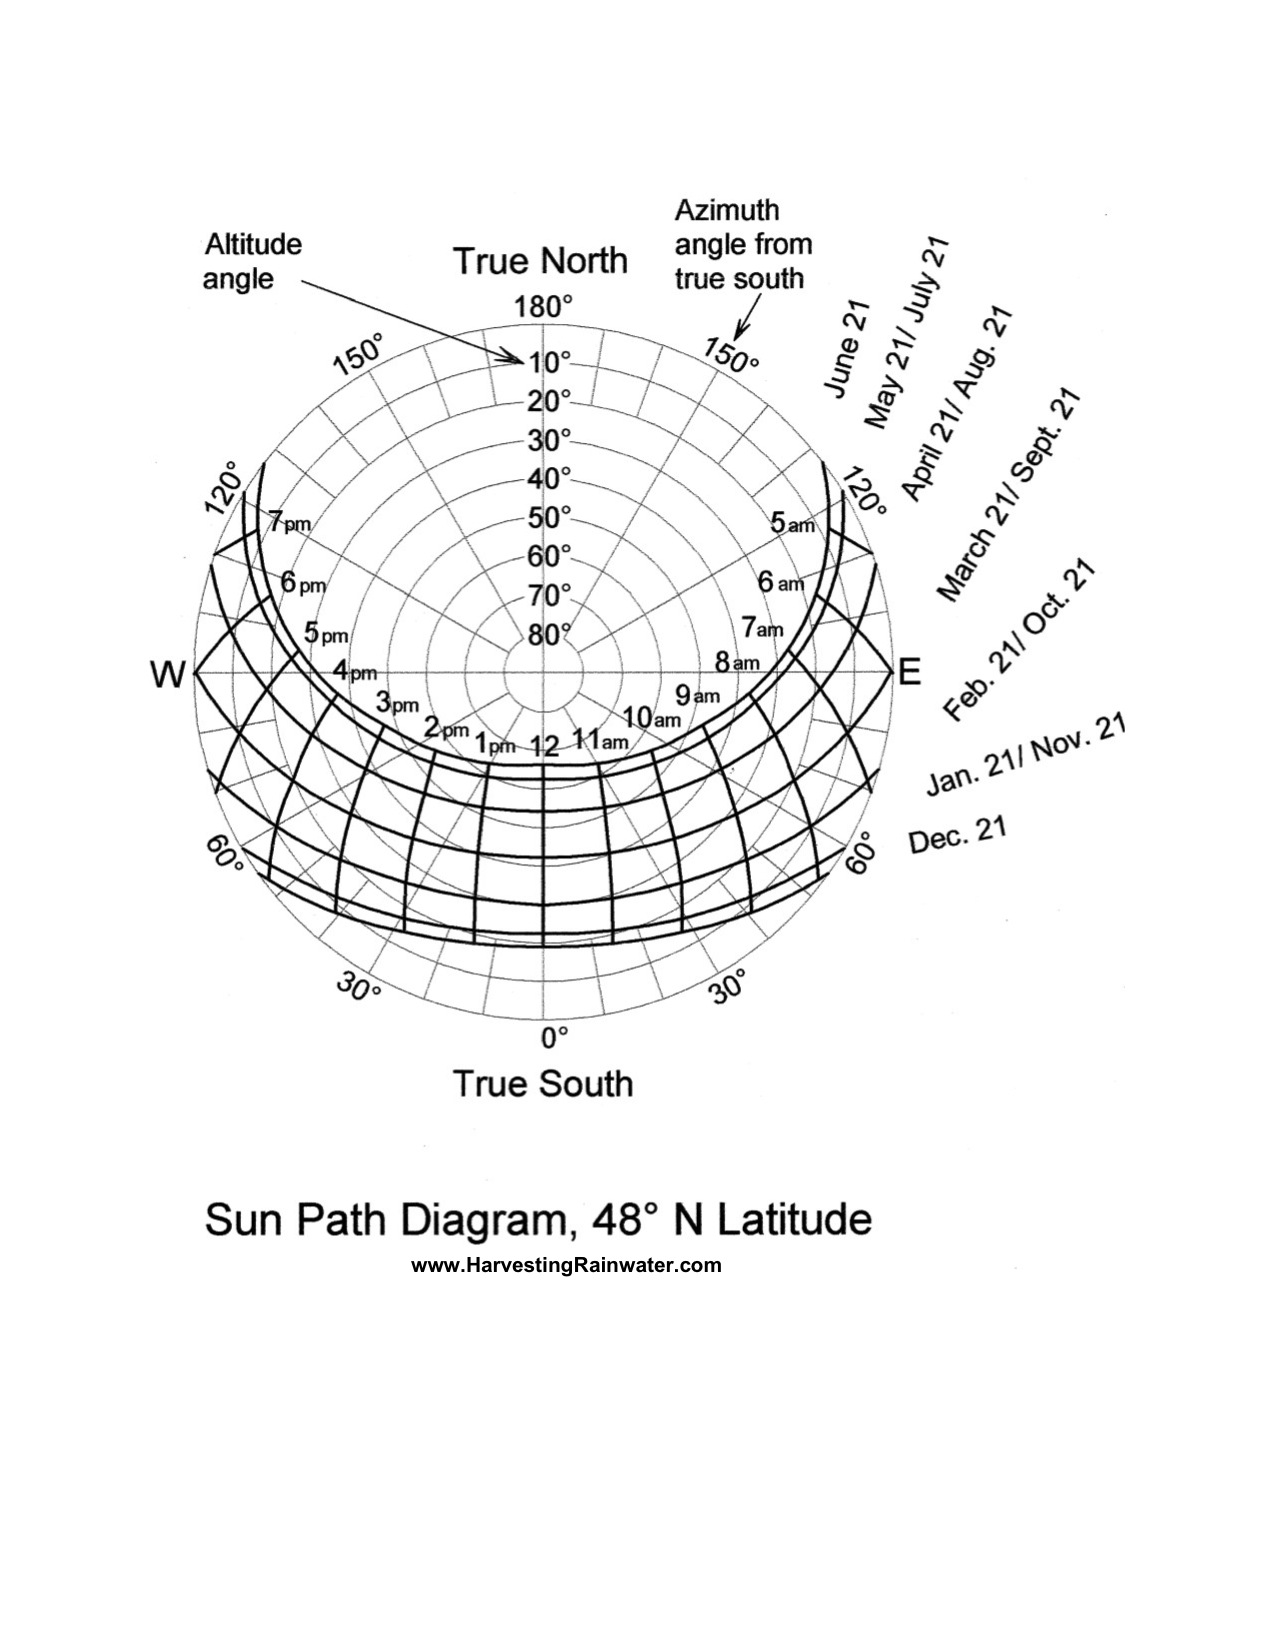 Sun Path Diagram 48o N Latitude